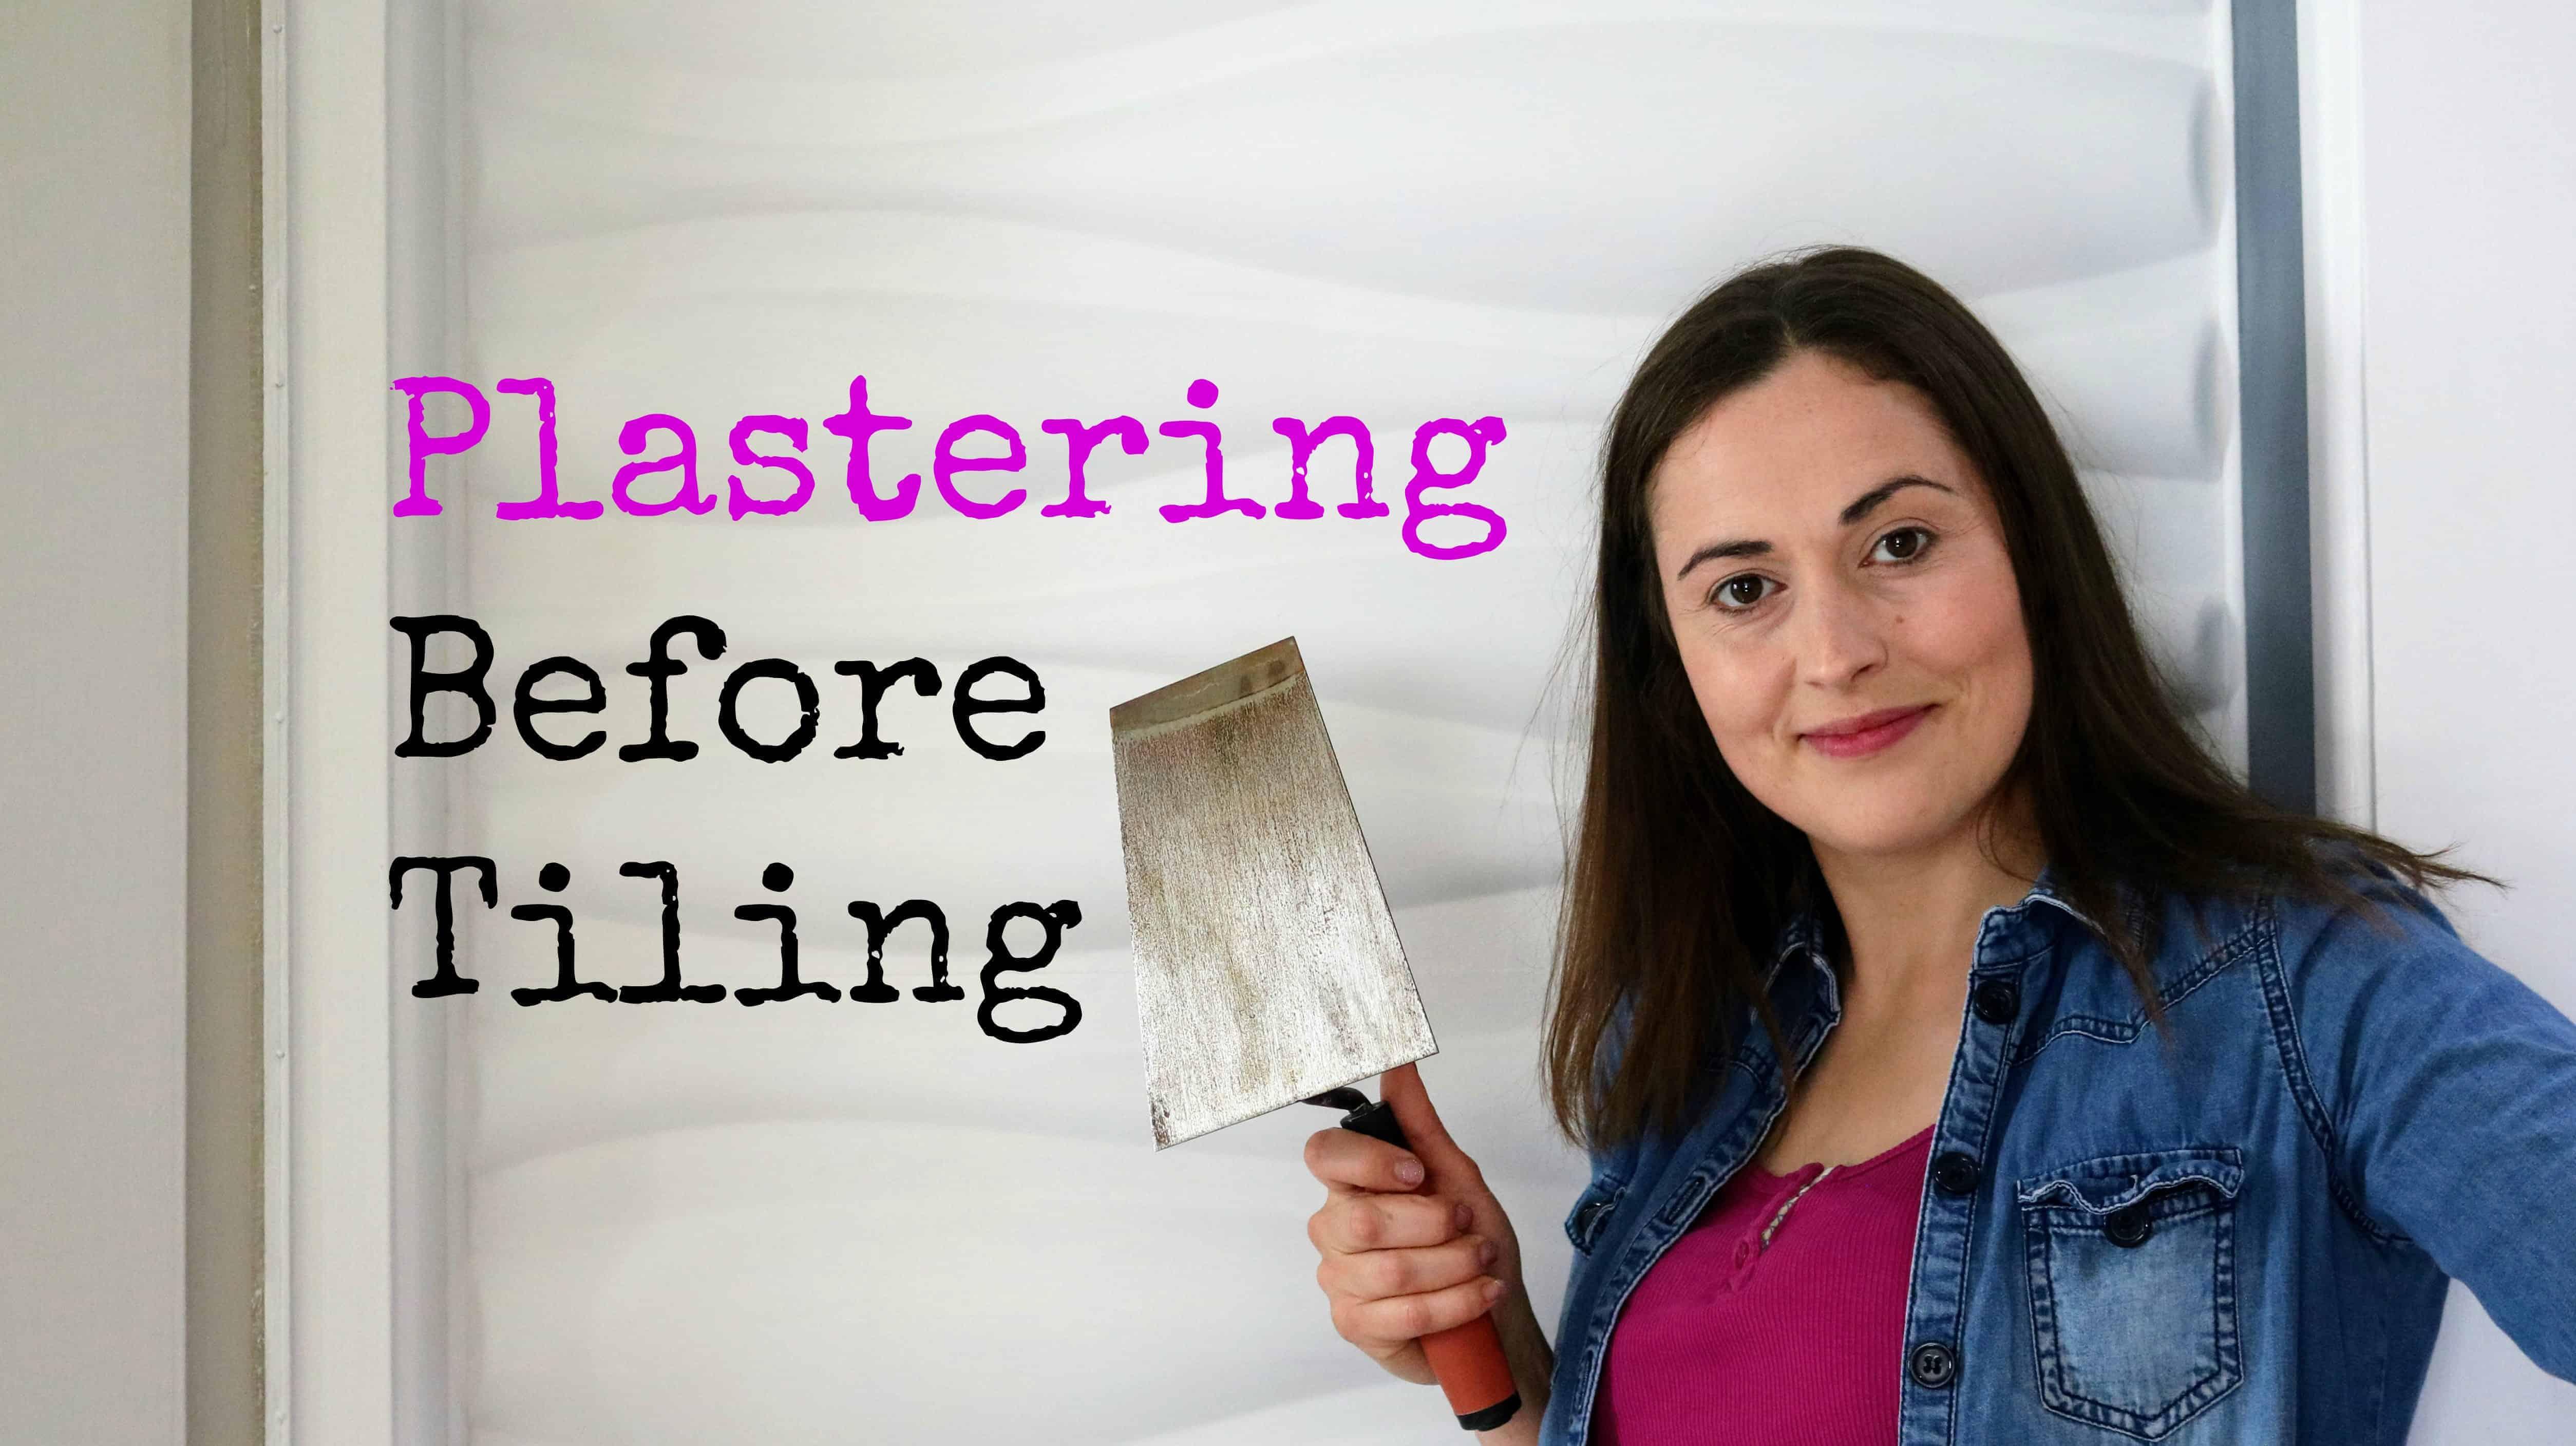 Diy Plastering Before Tiling The Carpenter S Daughter